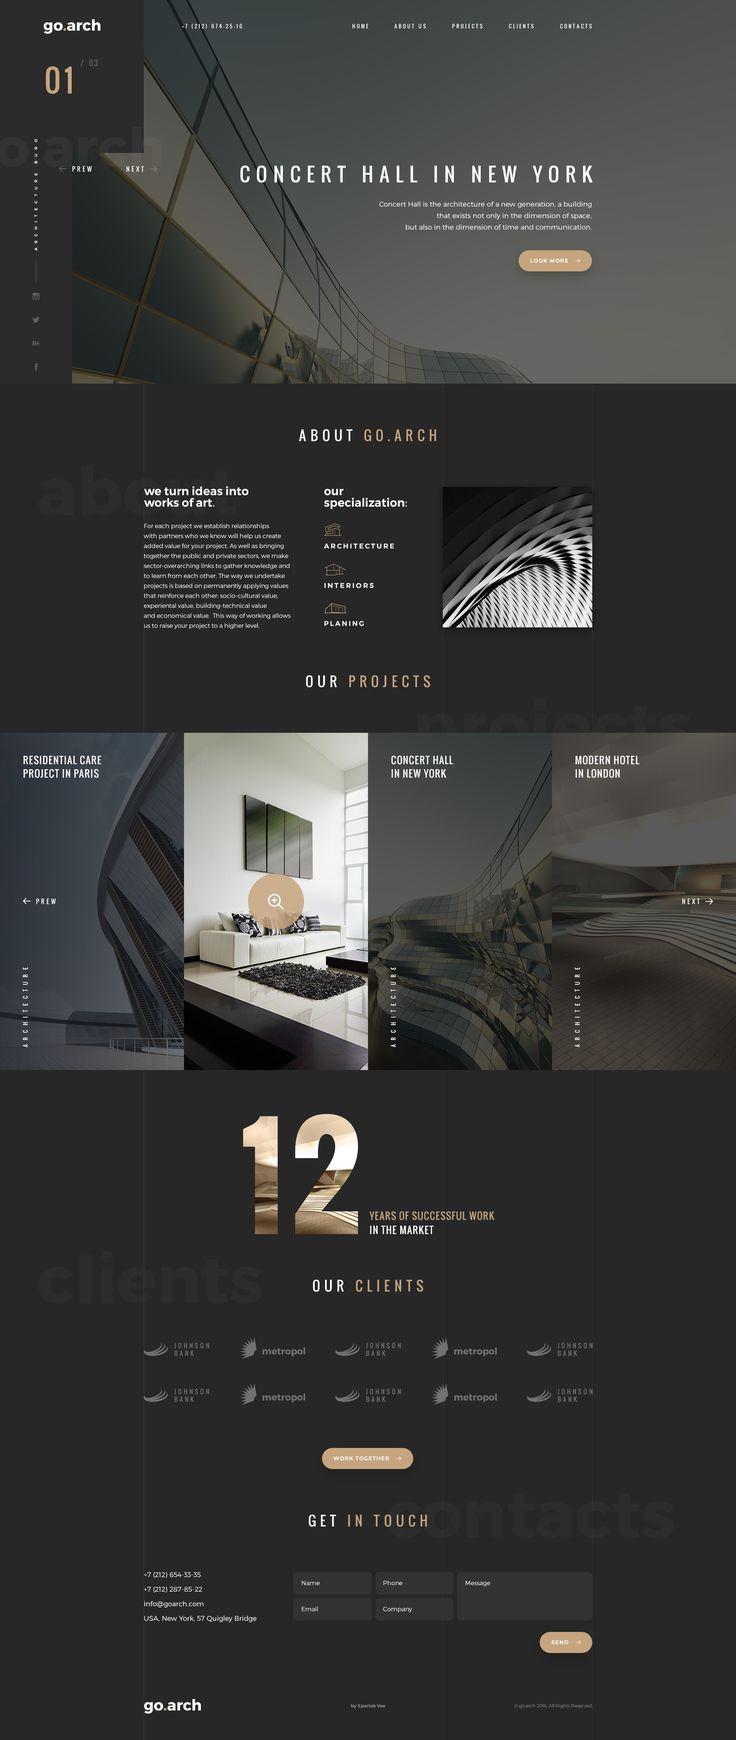 How To Design A Website The 4 Stages Process Web Design Design Web Webdesign